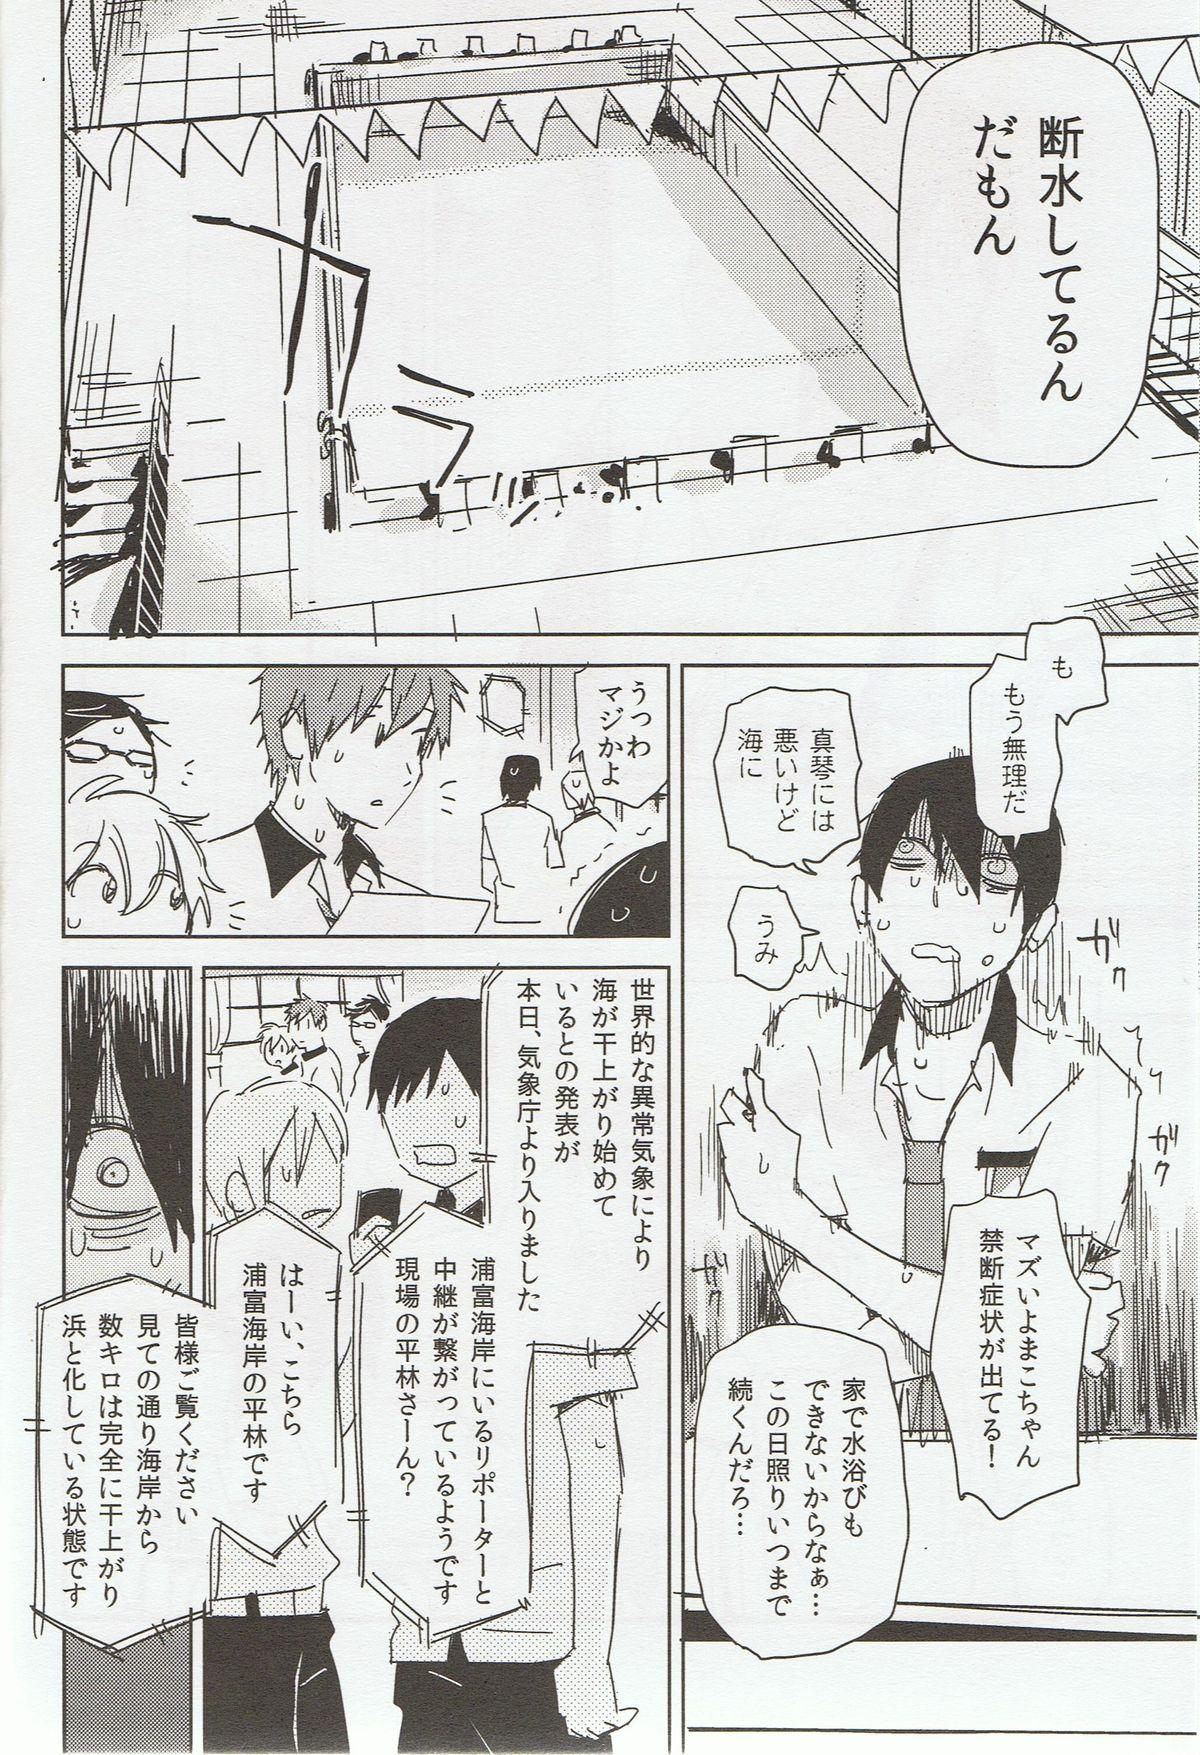 Sou da, Tottori Sakyuu Ikou. 6